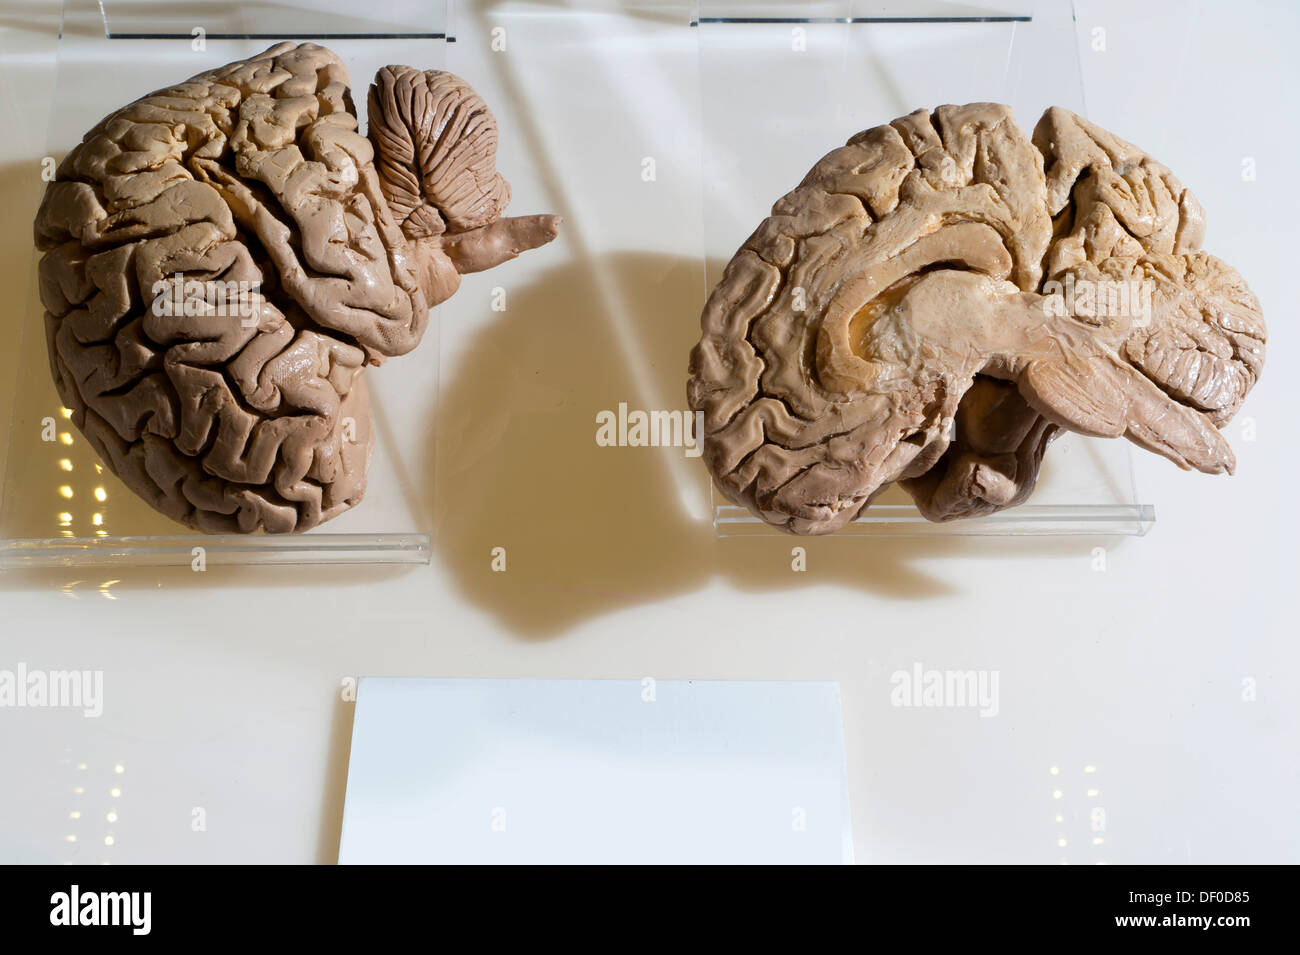 Plastination specimen of midsagittal cut of human brain - Stock Image